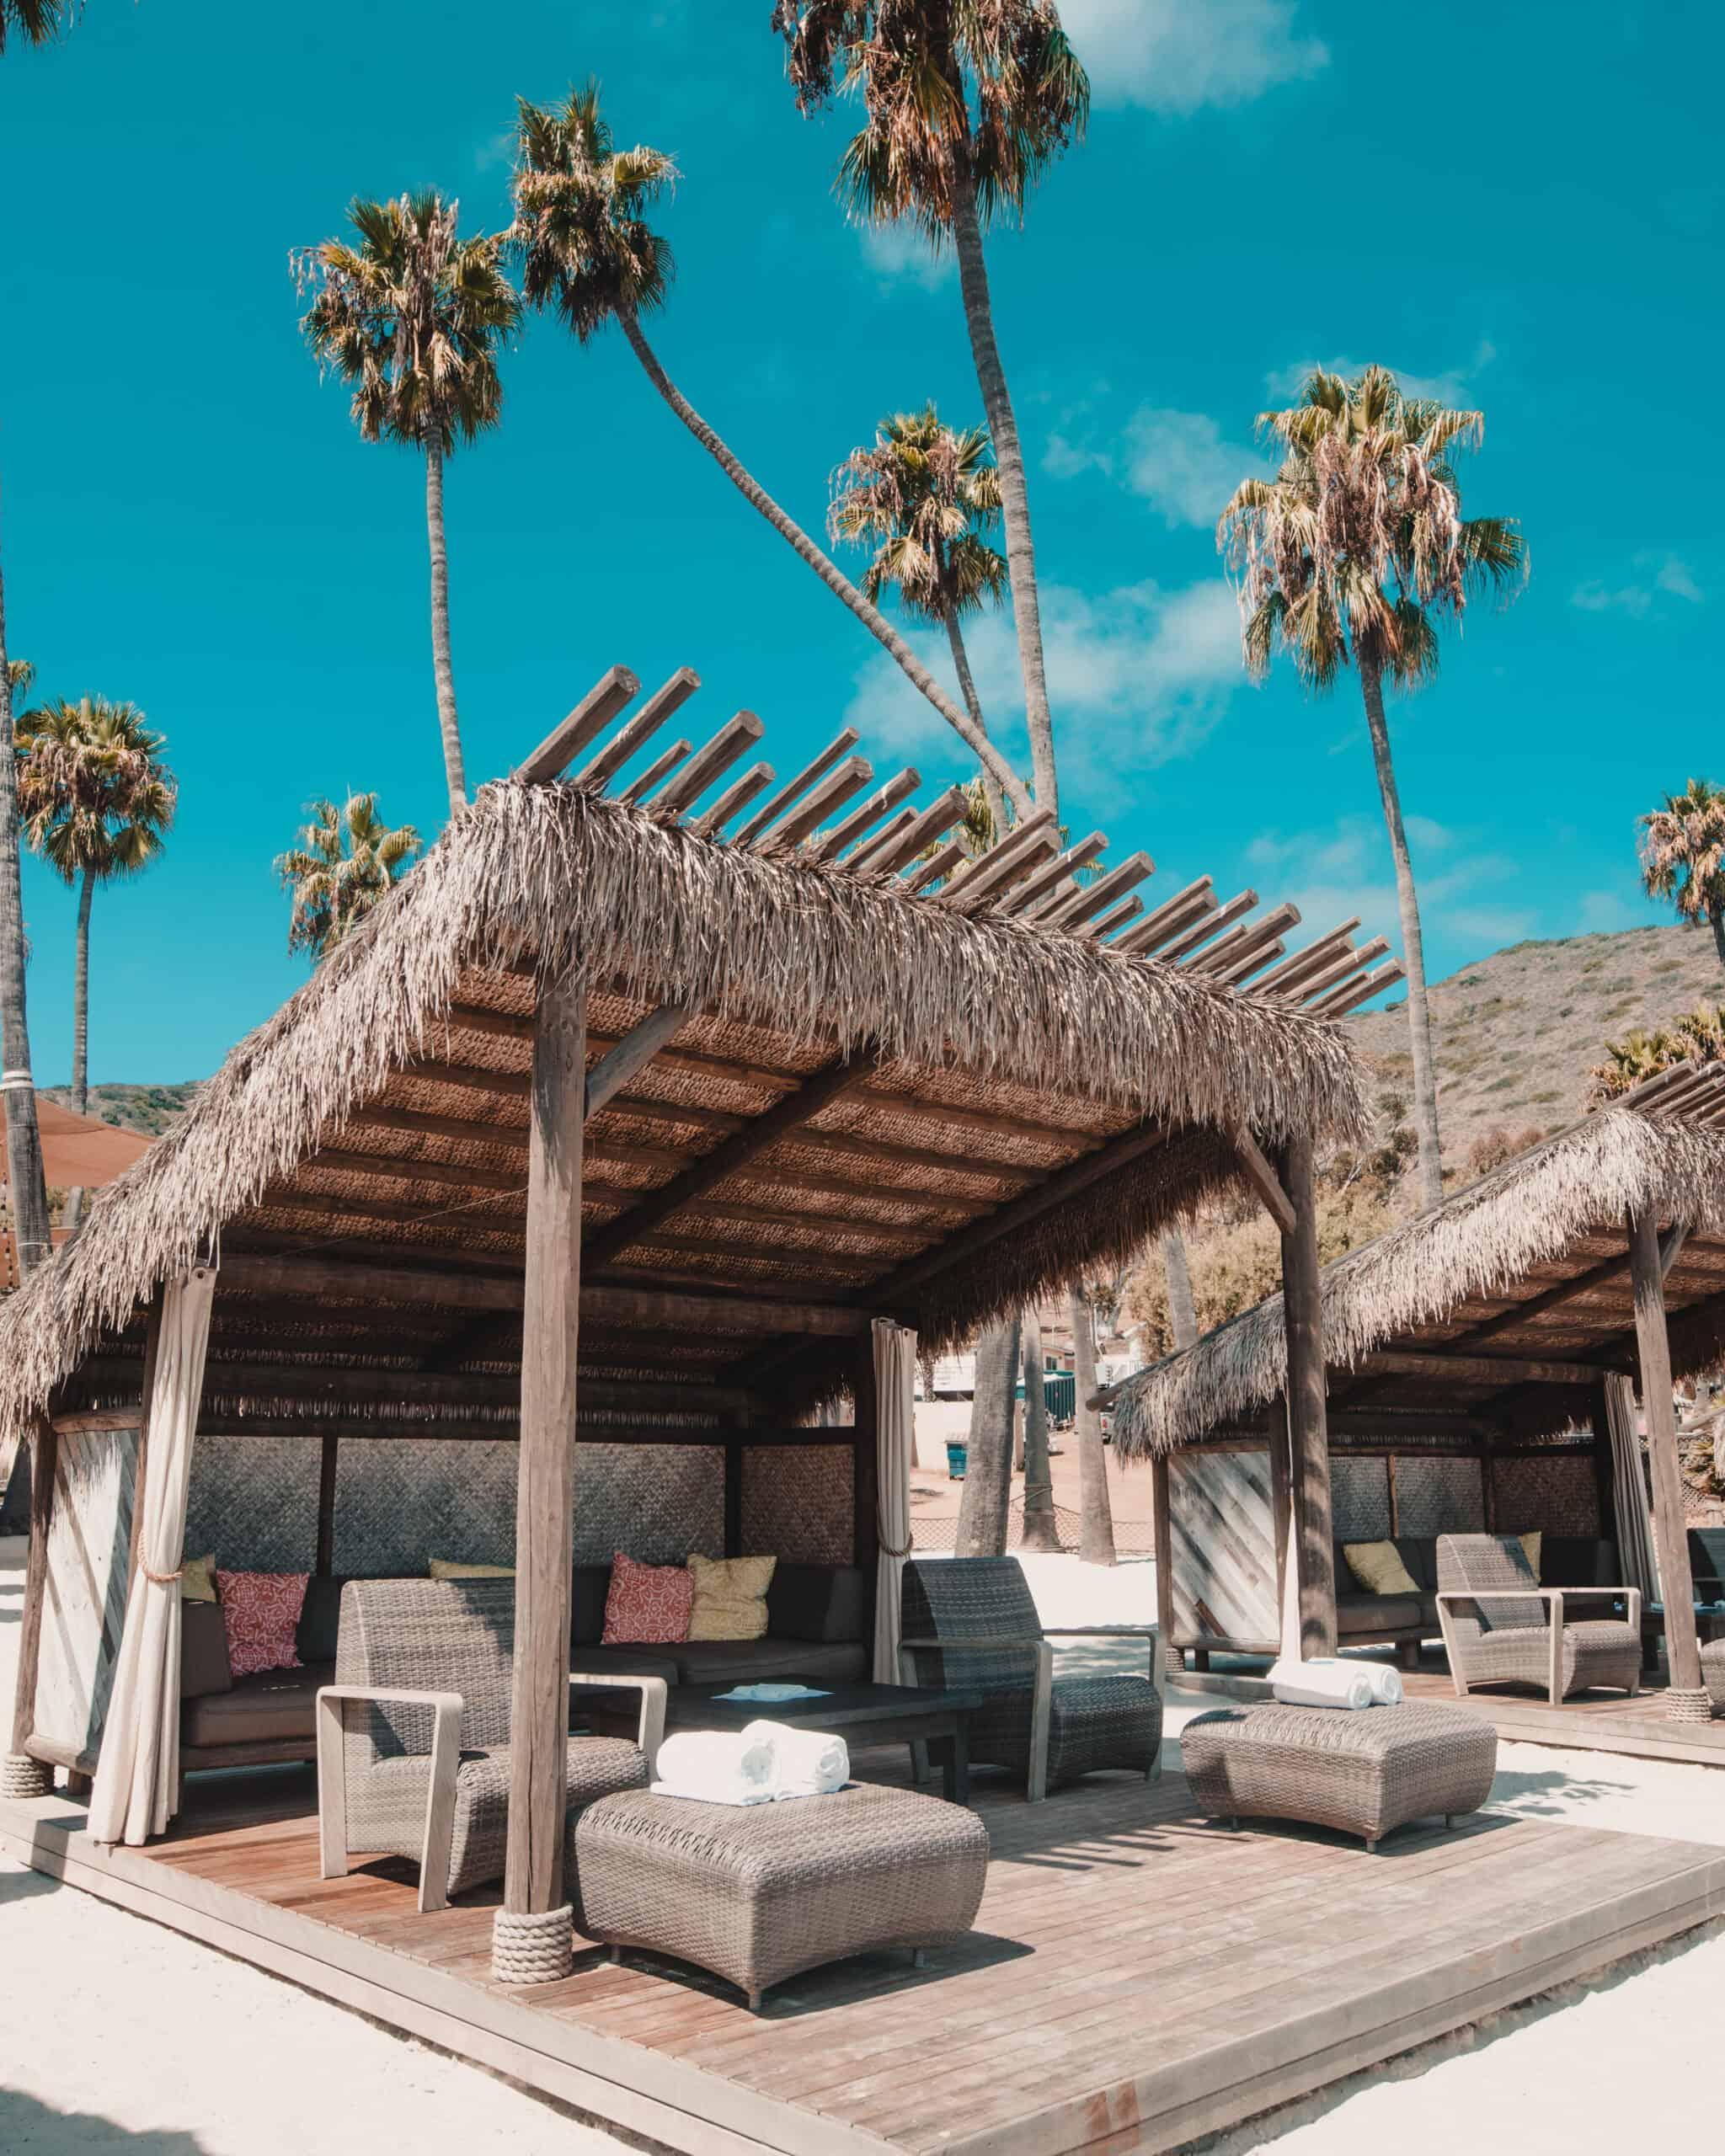 Harbor Sands Catalina Island California